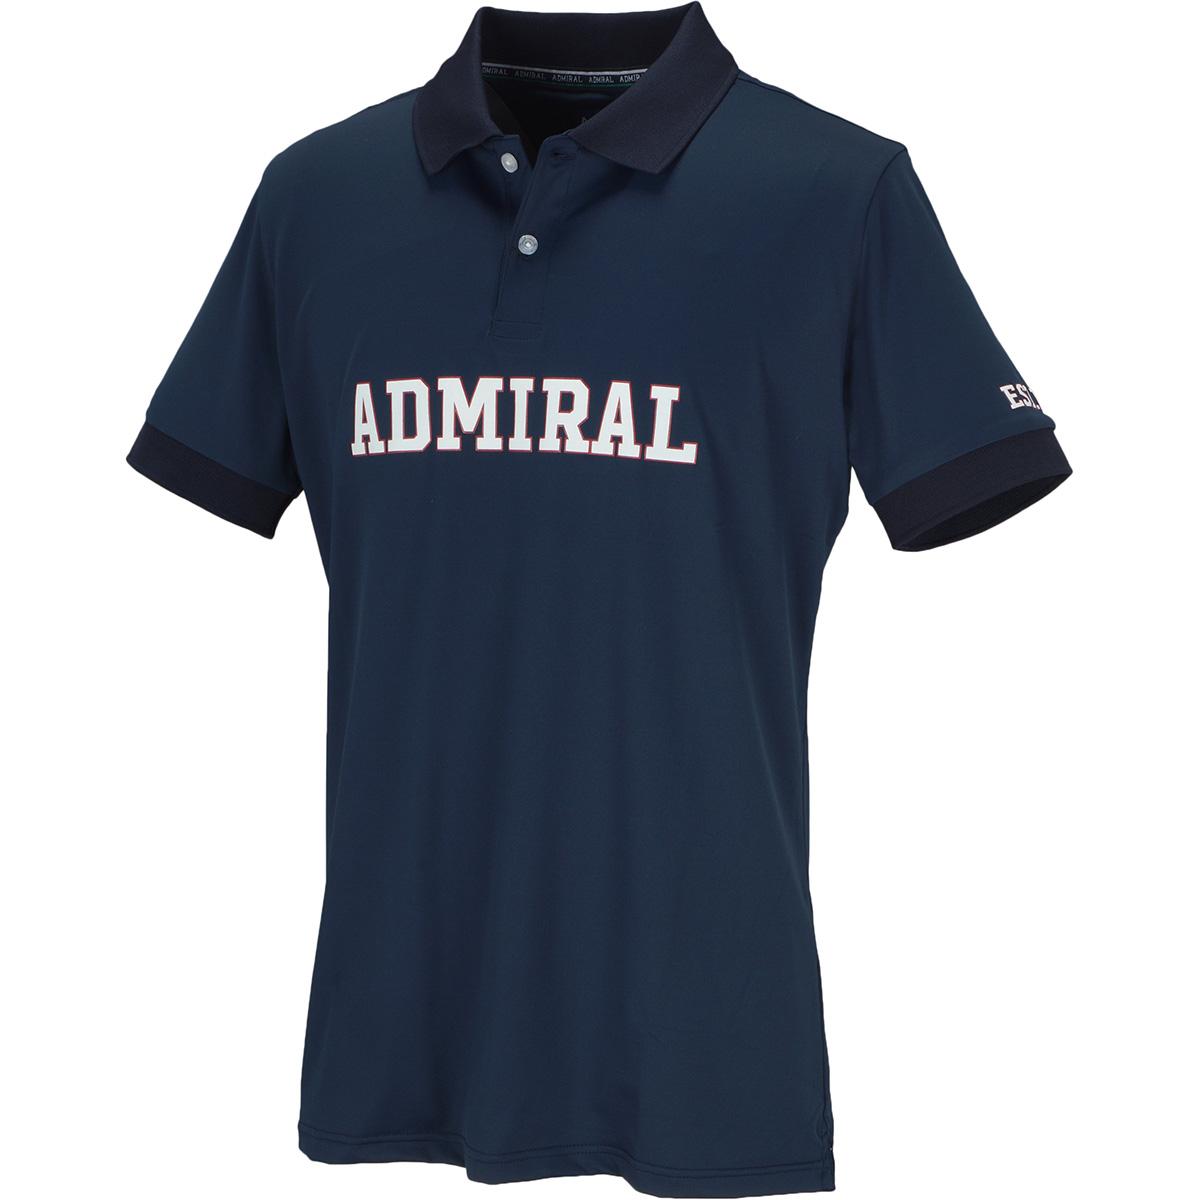 GDO限定 ADMIRAL LOGO 半袖ポロシャツ